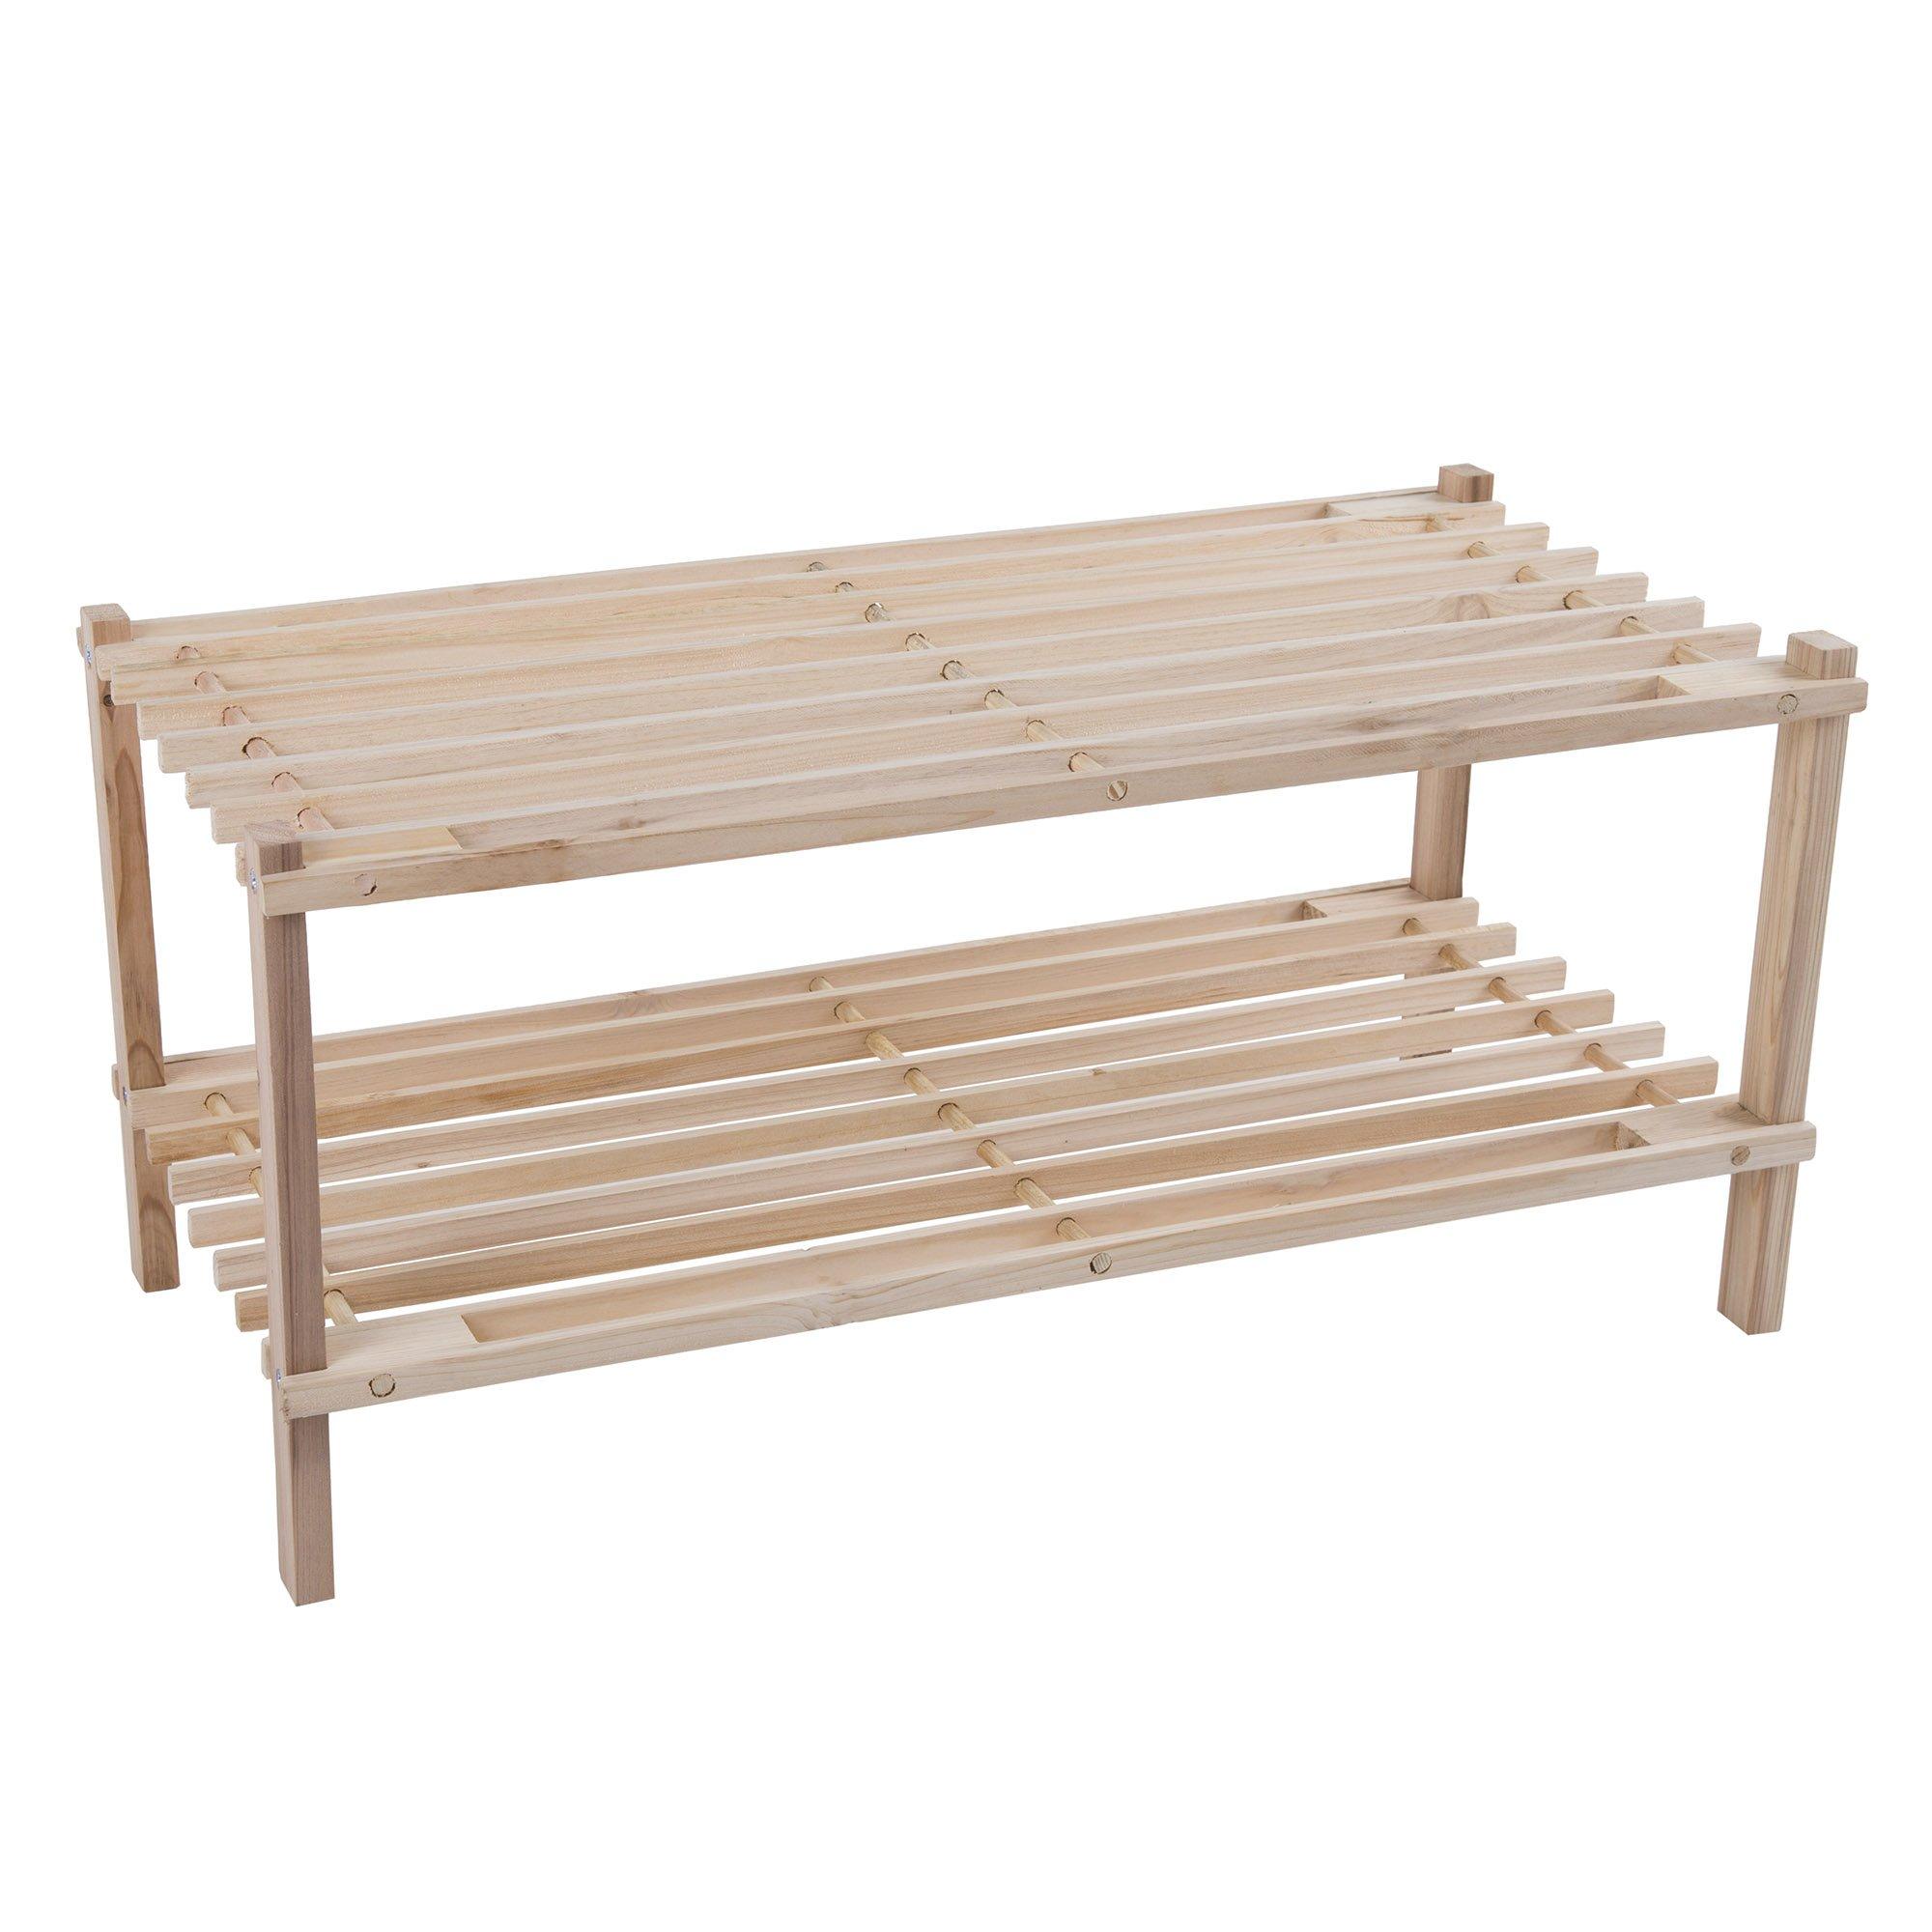 Lavish Home Wood Shoe Rack, Storage Bench – Closet, Bathroom, Kitchen, Entry Organizer, 2-Tier Space Saver Shoe Rack